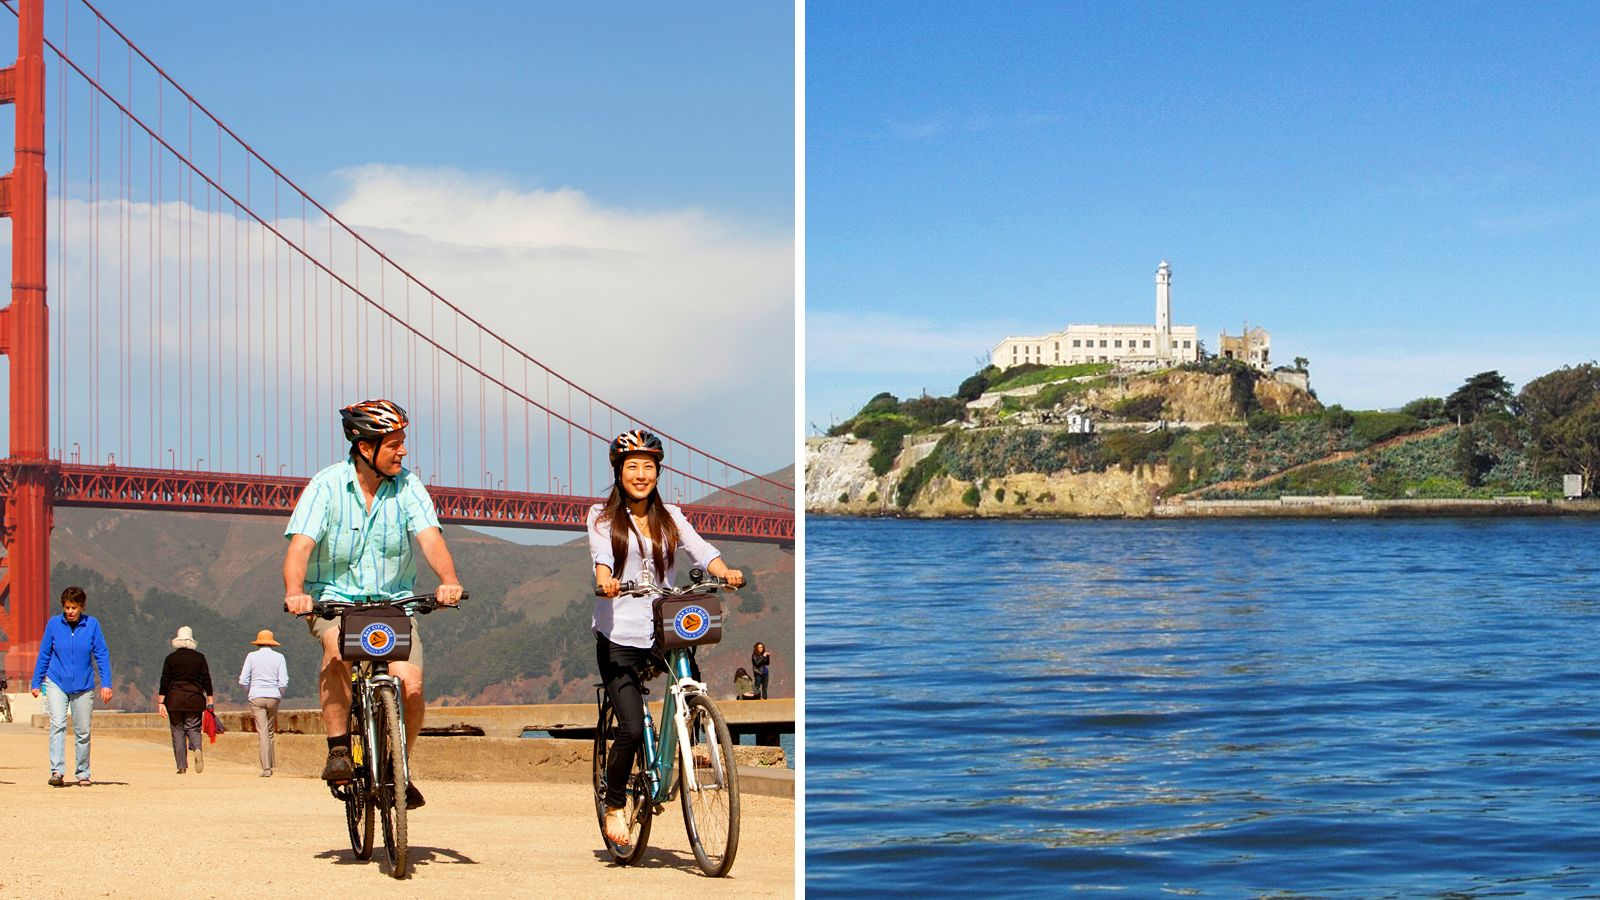 2-Day Combo: Golden Gate Bridge Biking Tour with Alcatraz Admission